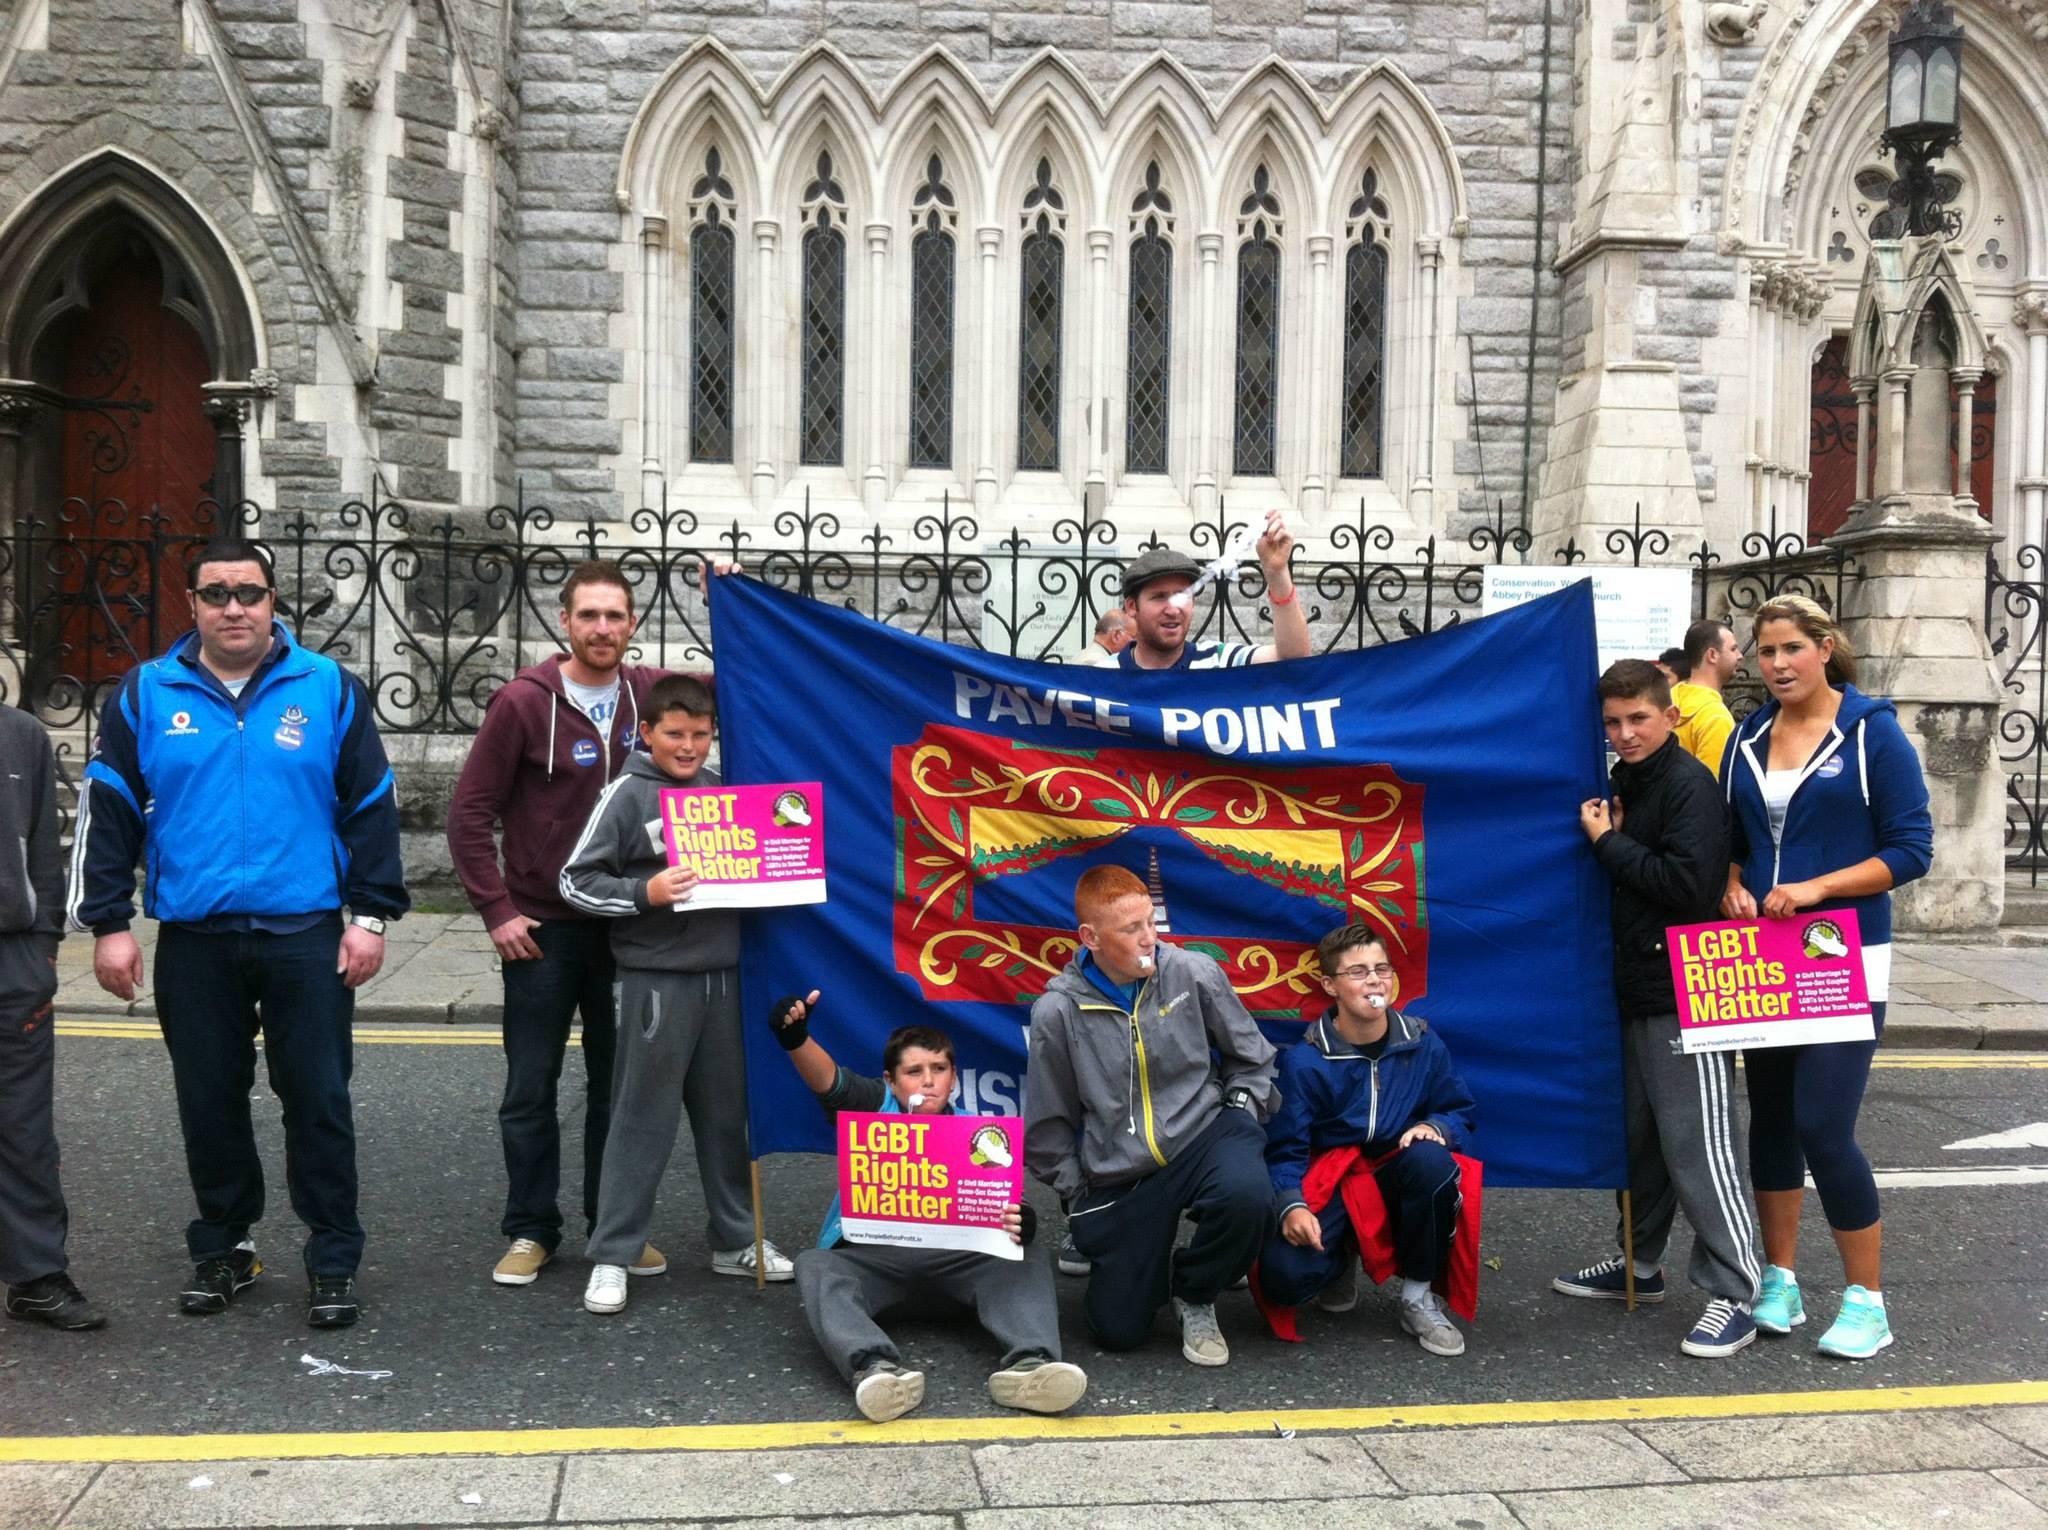 2013 Dublin Pride Parade. pic 3